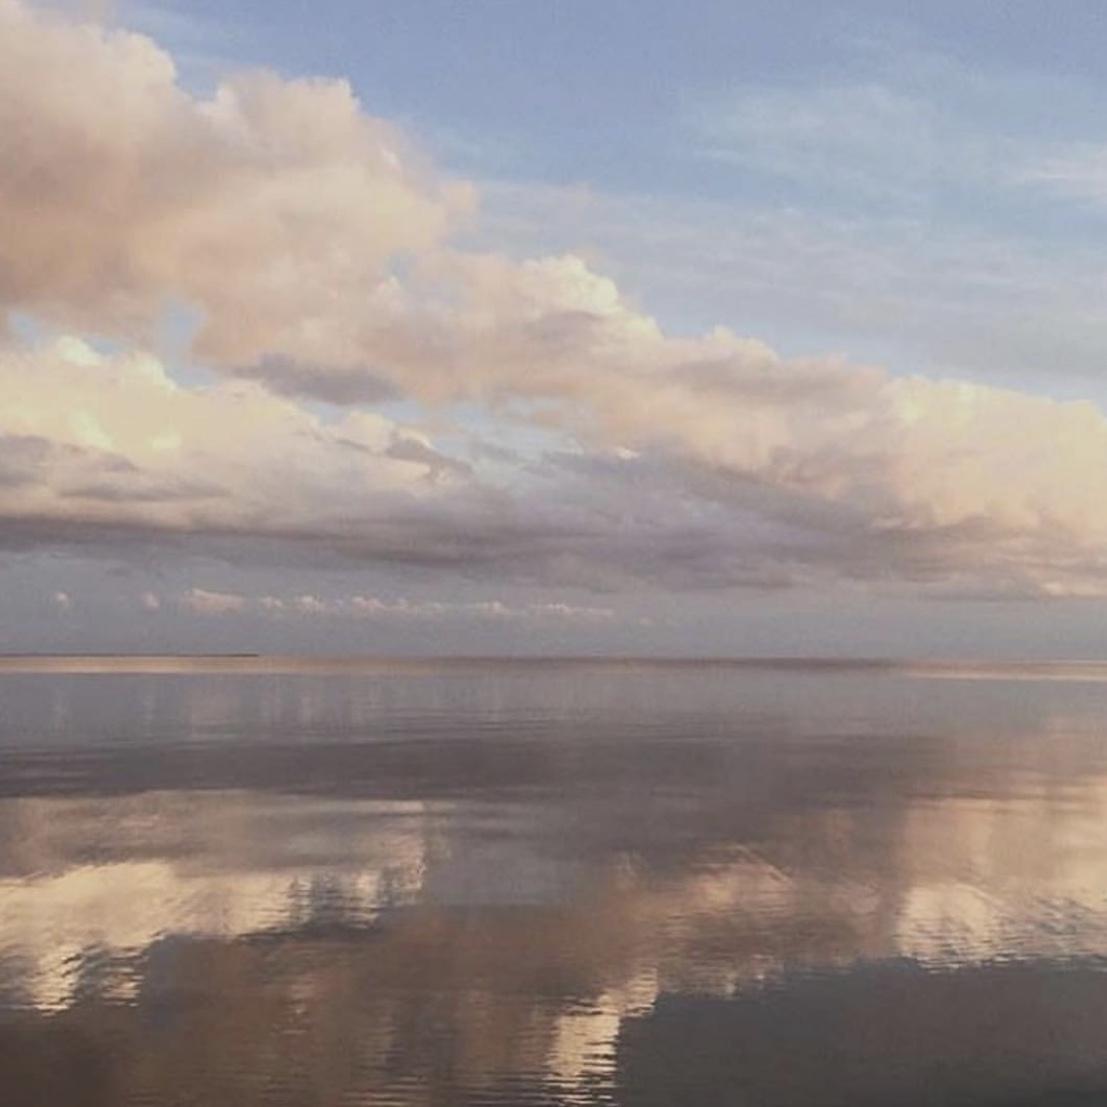 ocean-water-wave-reflection.jpg